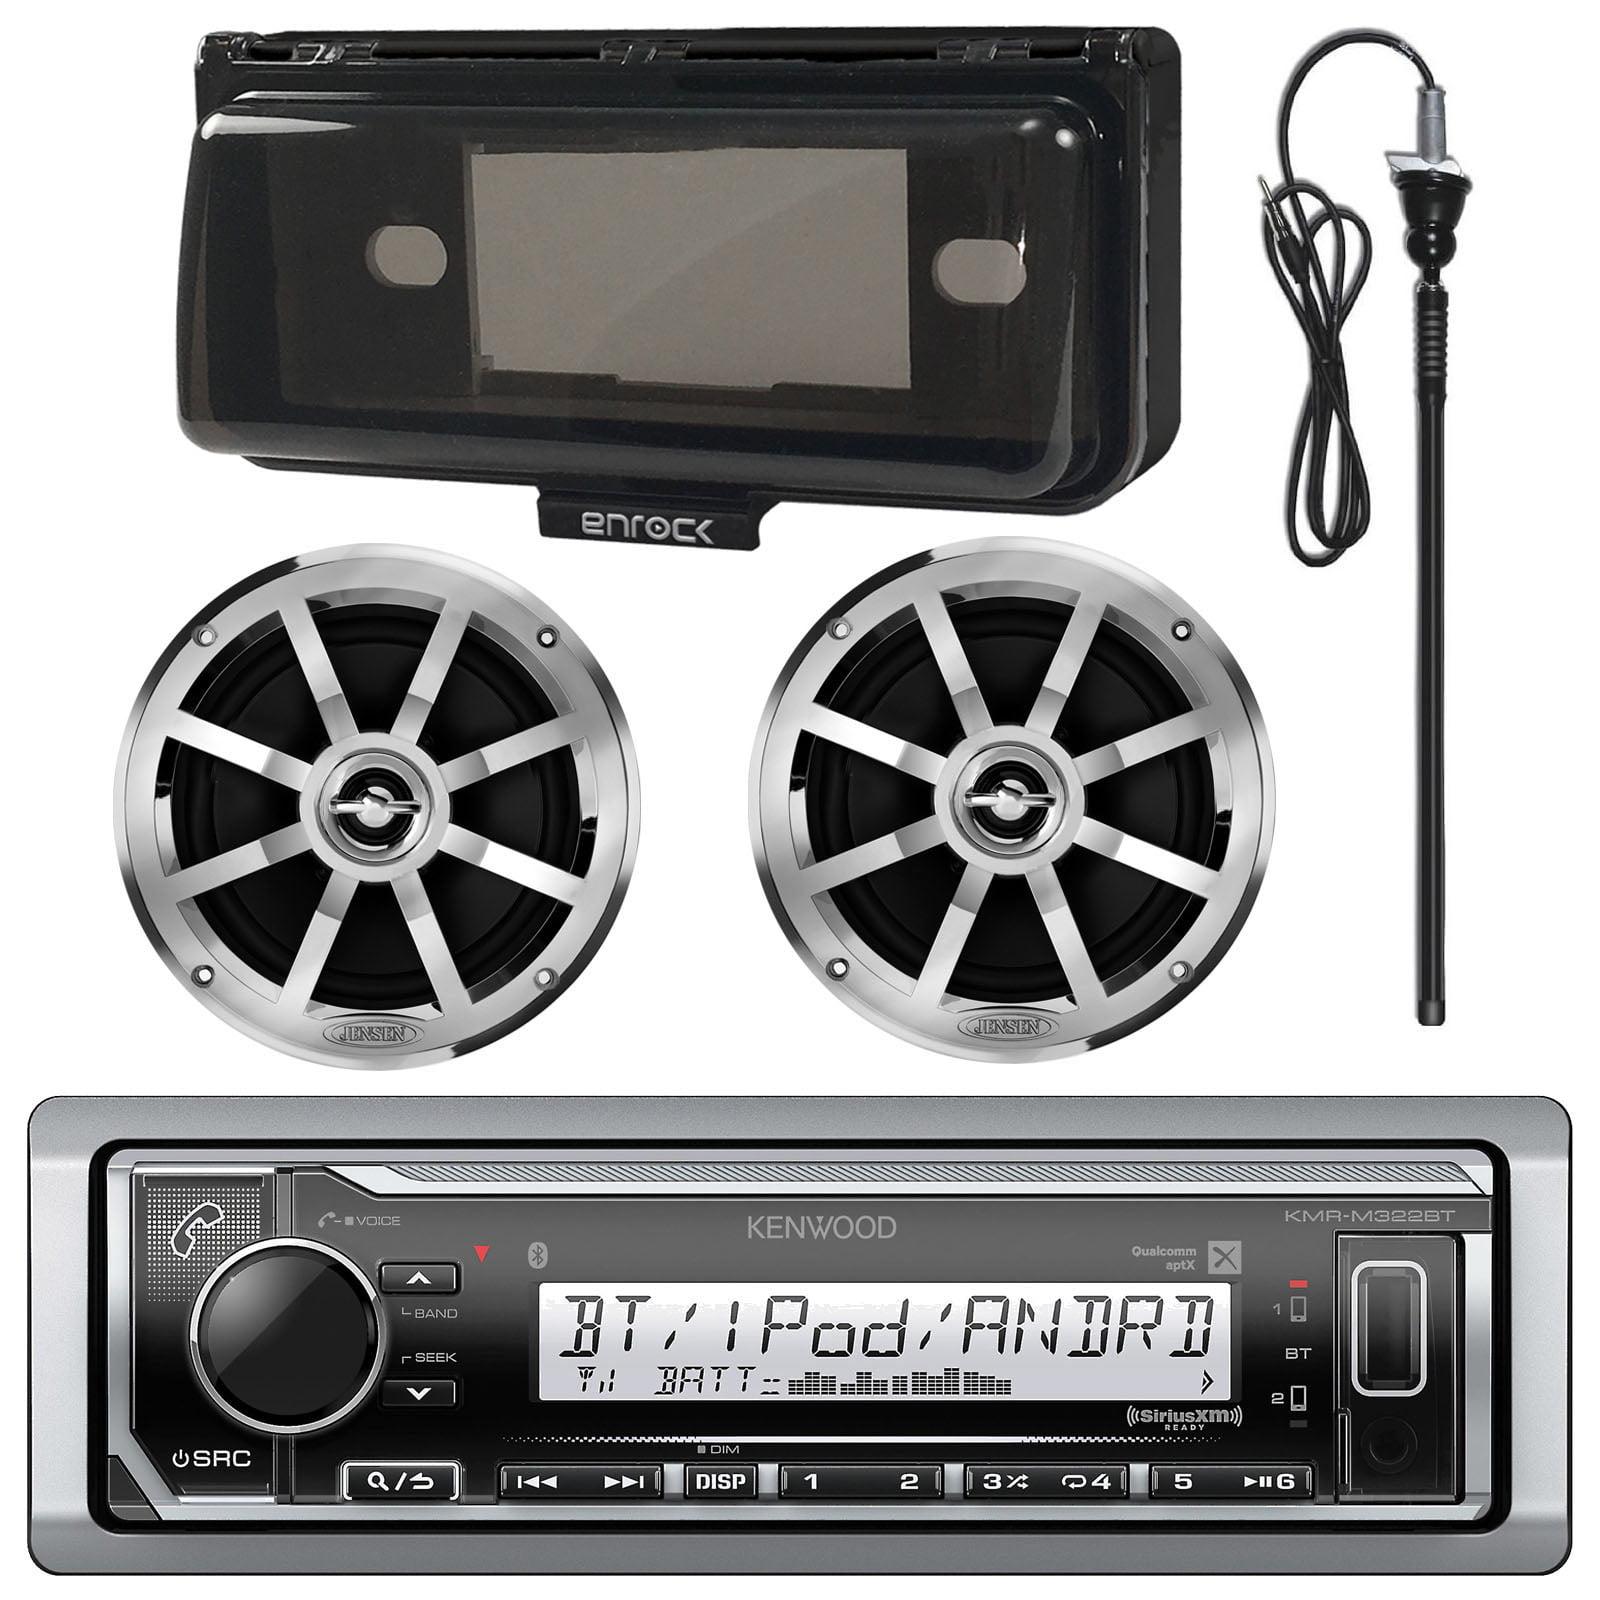 "Kenwood Marine Digital Media Bluetooth Receiver, 2x Jensen Boat 6.5"" Silver Speaker - Single, Enrock Marine Single Din Radio Dash Protector (Black), Enrock AM/FM Antenna (Black)"